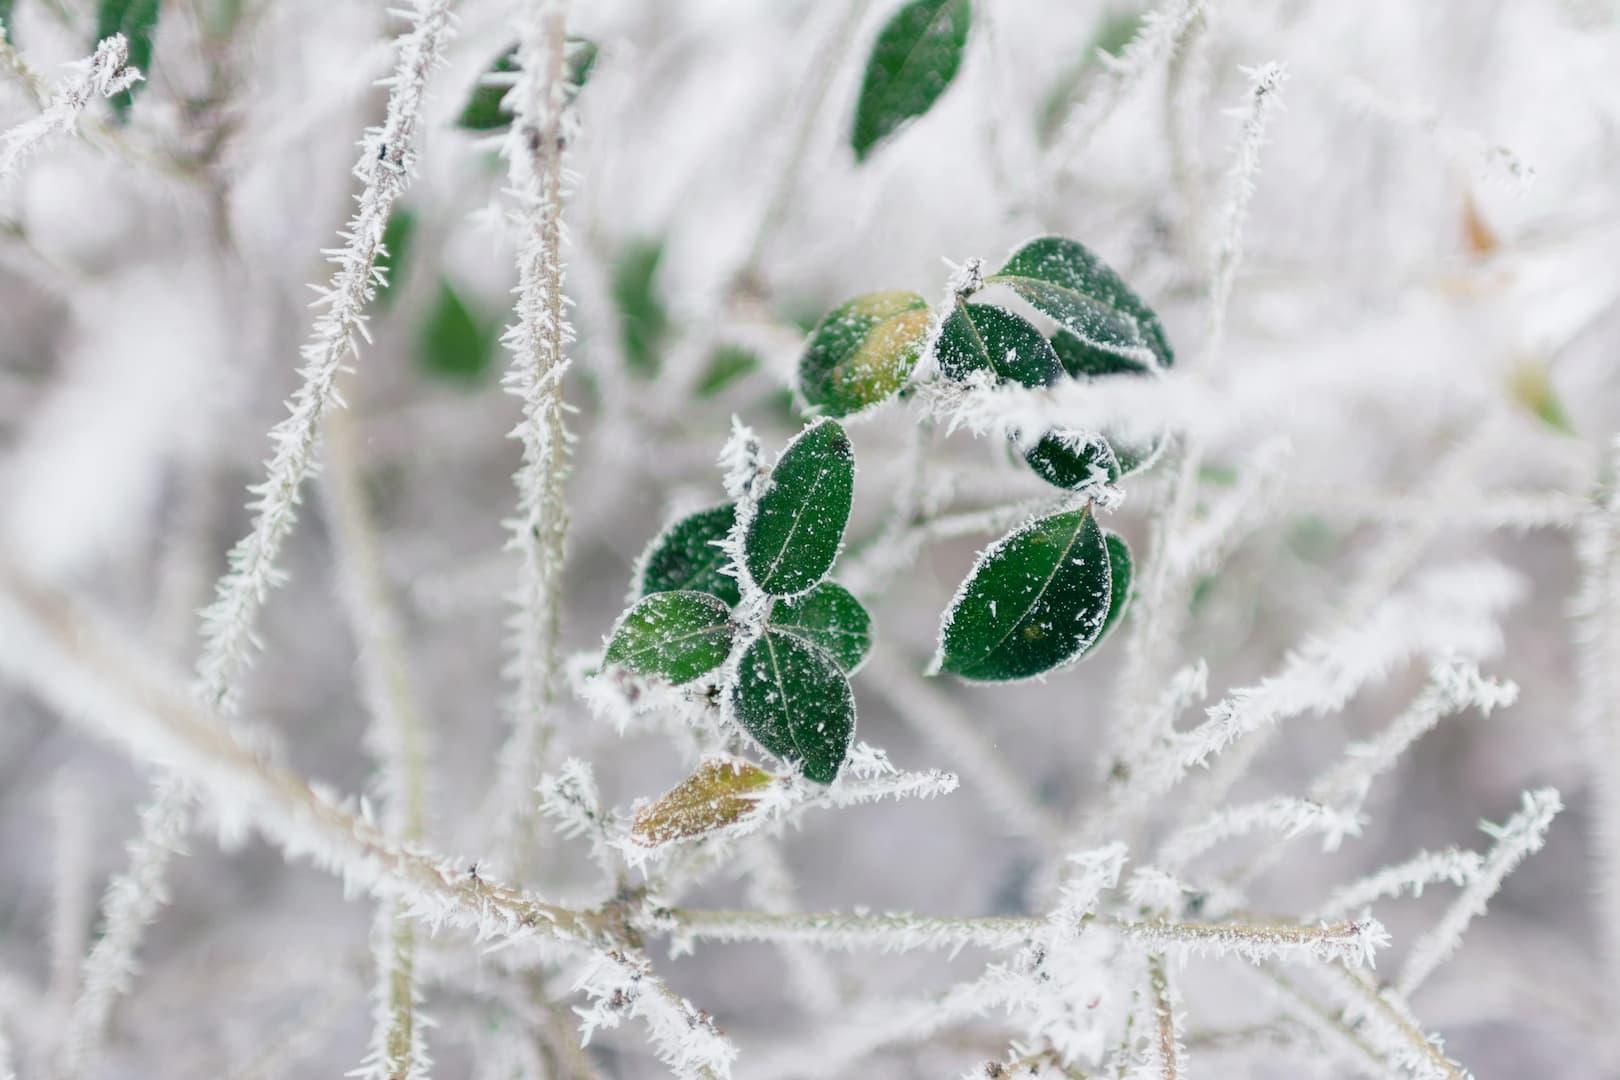 Naturopathie et défenses immunitaires